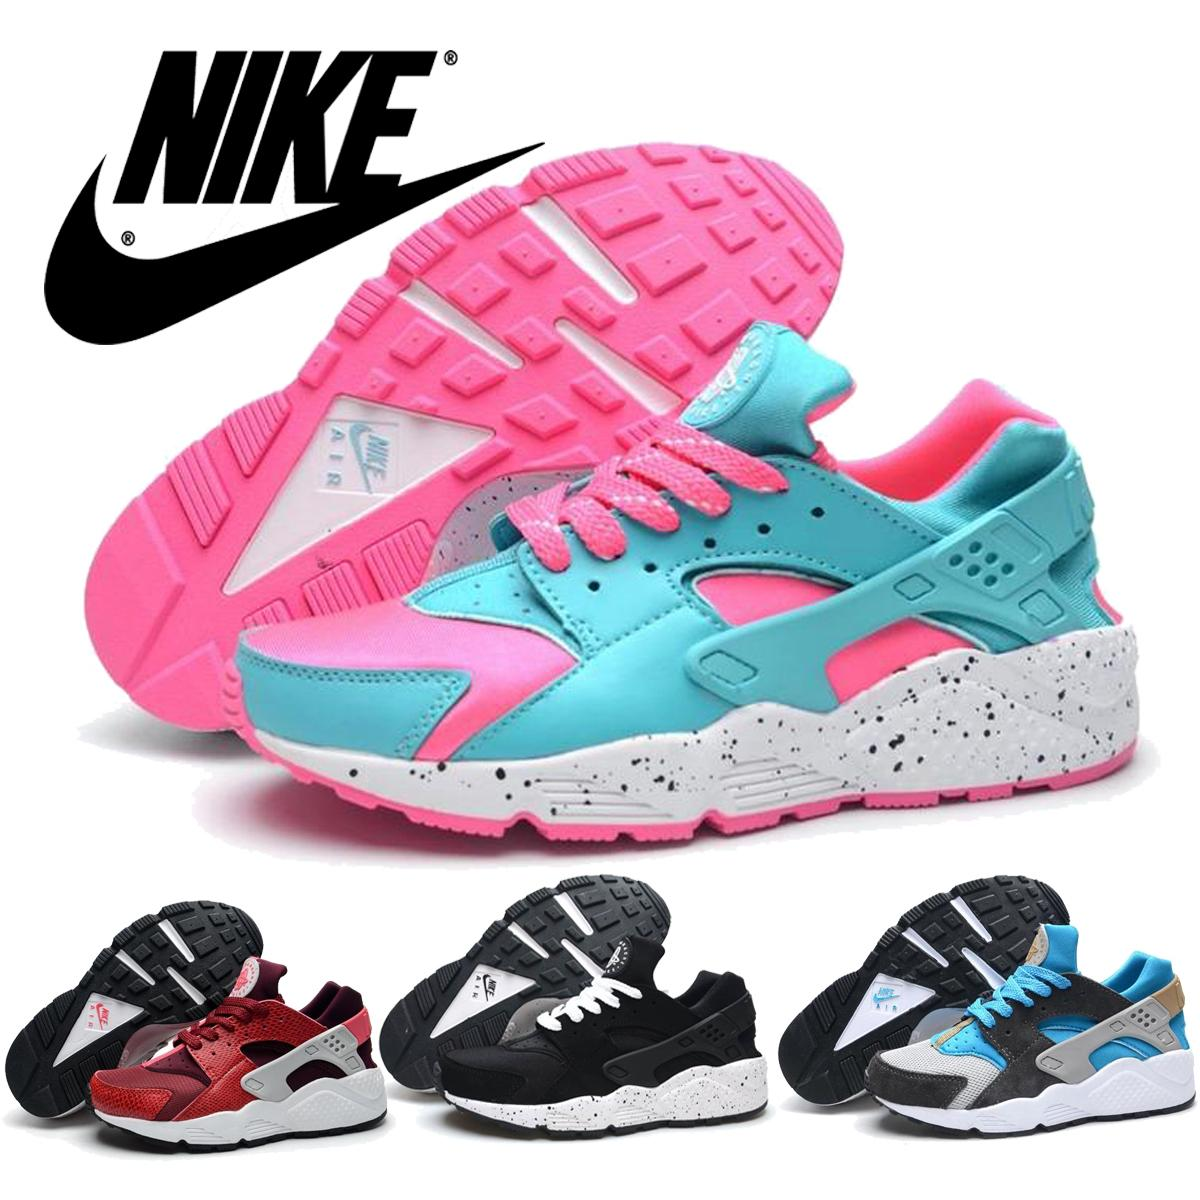 wholesale nike huarache shoes for womens cheap top quality